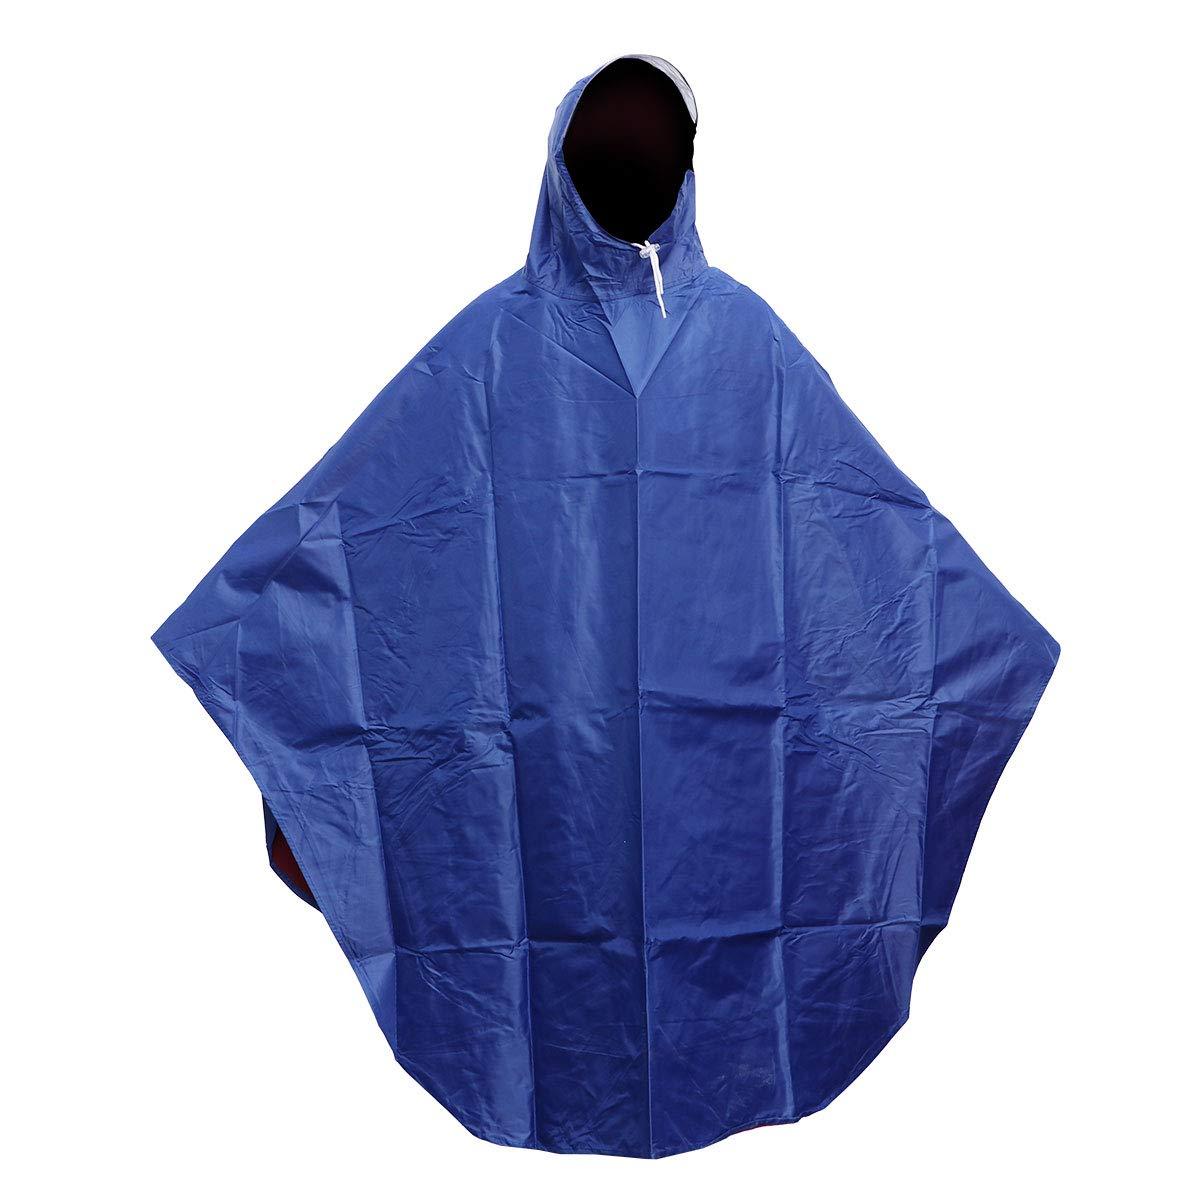 Vosarea Rain Poncho for Adults Men Women Reusable Packable Waterproof Raincoat Rain Cape with Sleeves Hat